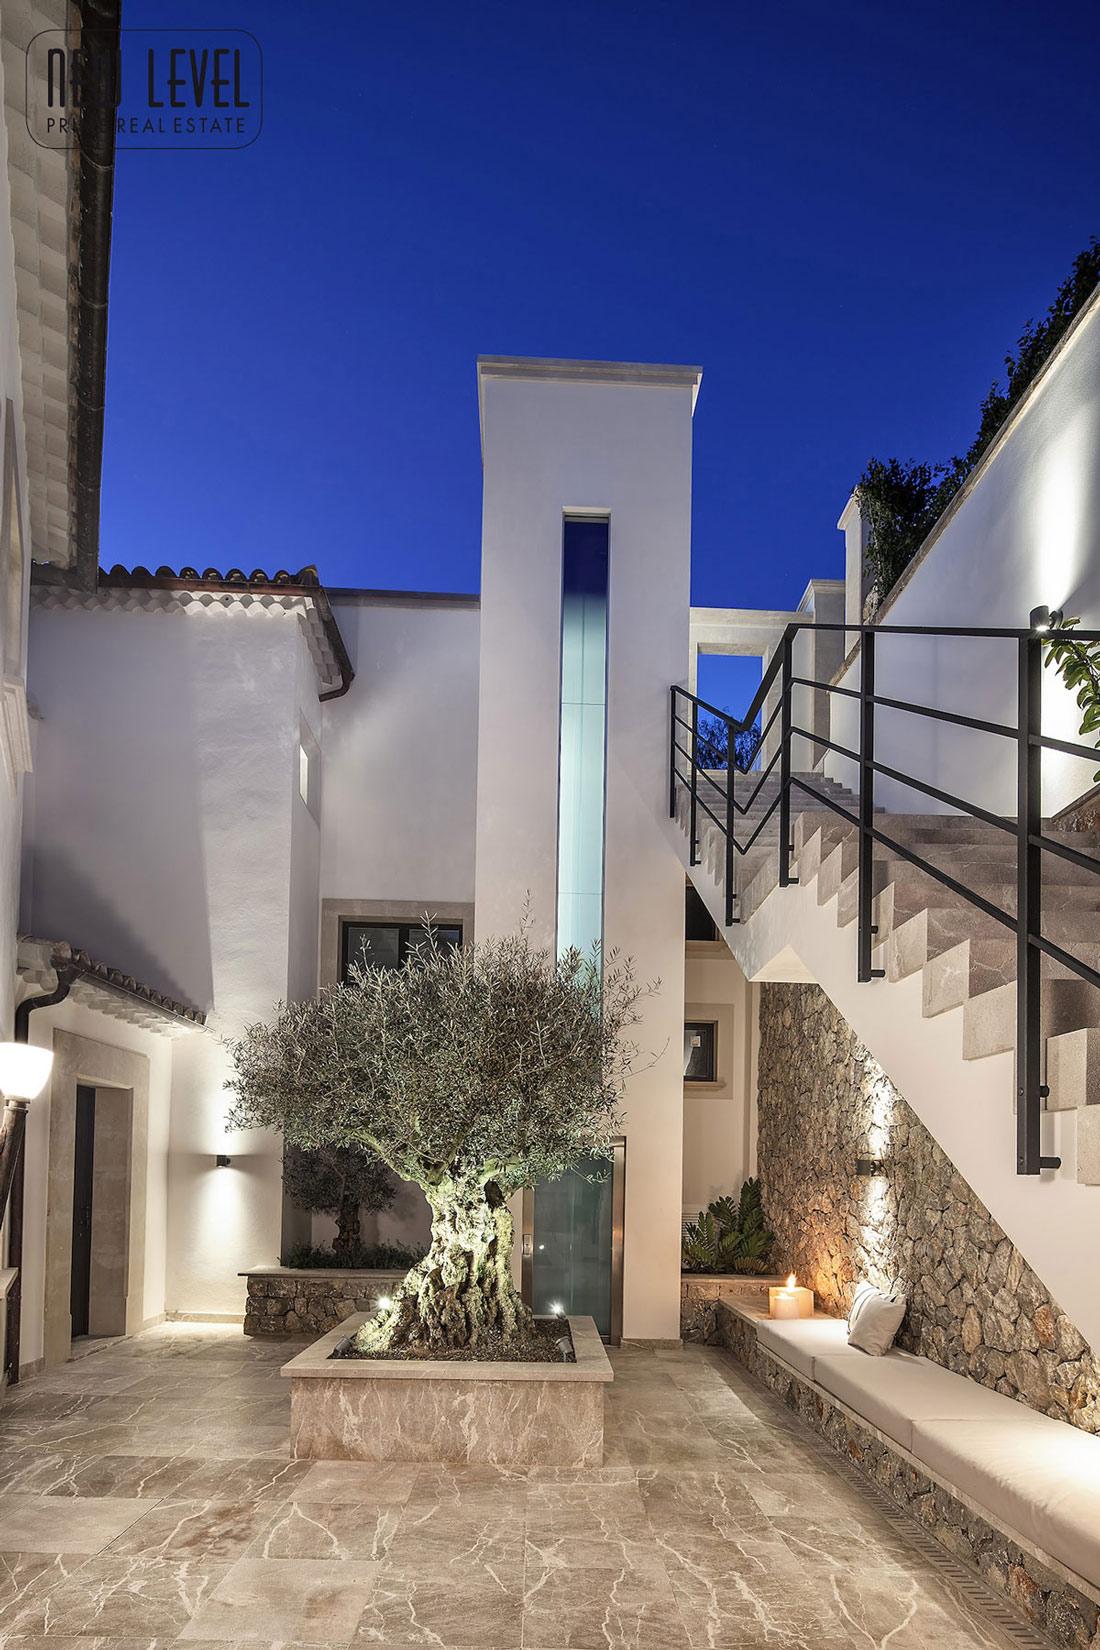 Outdoor Stairs, Marble Tiles, Lighting, Fabulous Villa in Puerto de Andratx, Mallorca